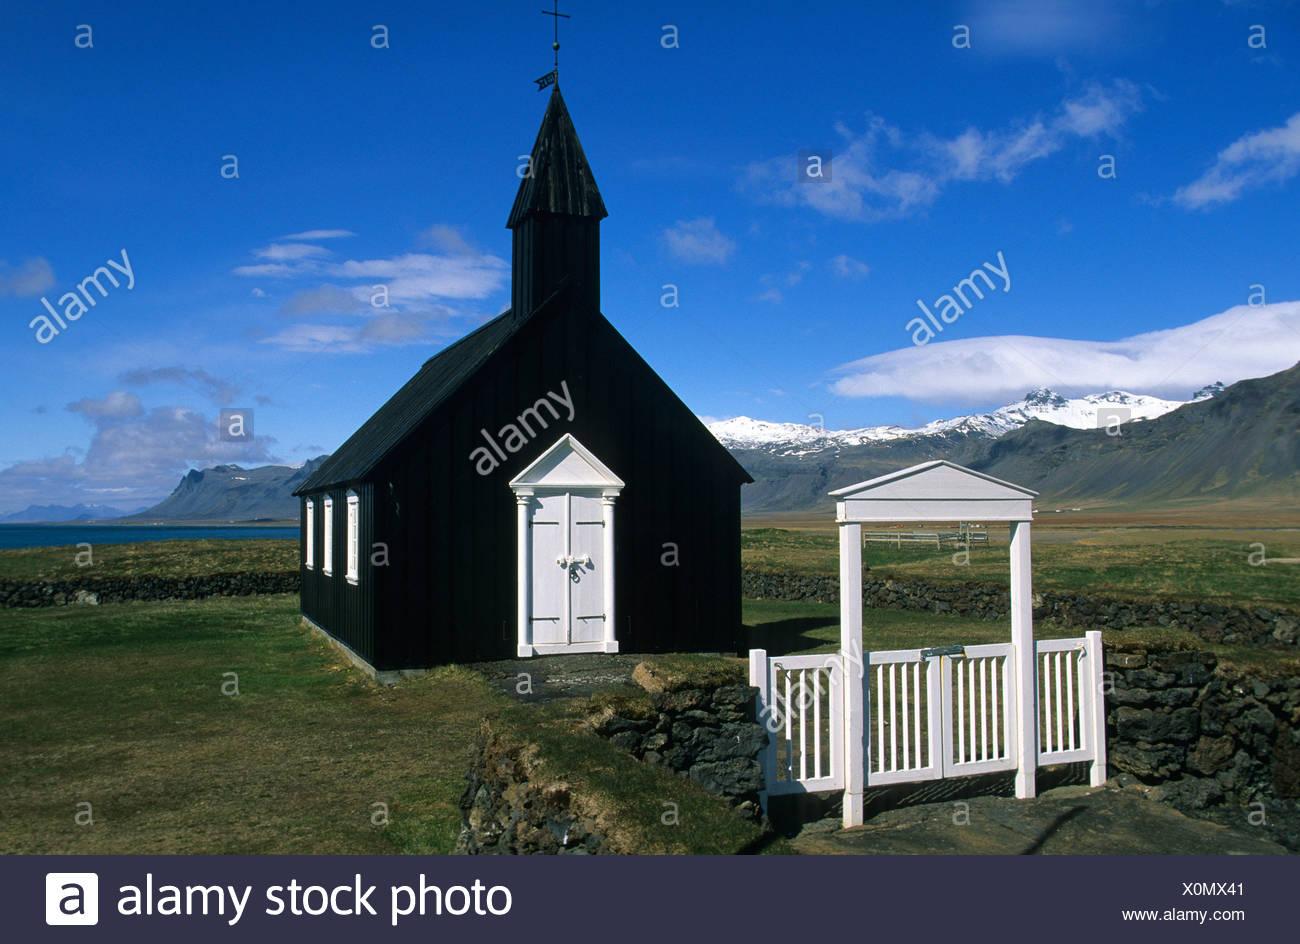 Budir Iceland church gate stone wall mountains wooden church - Stock Image